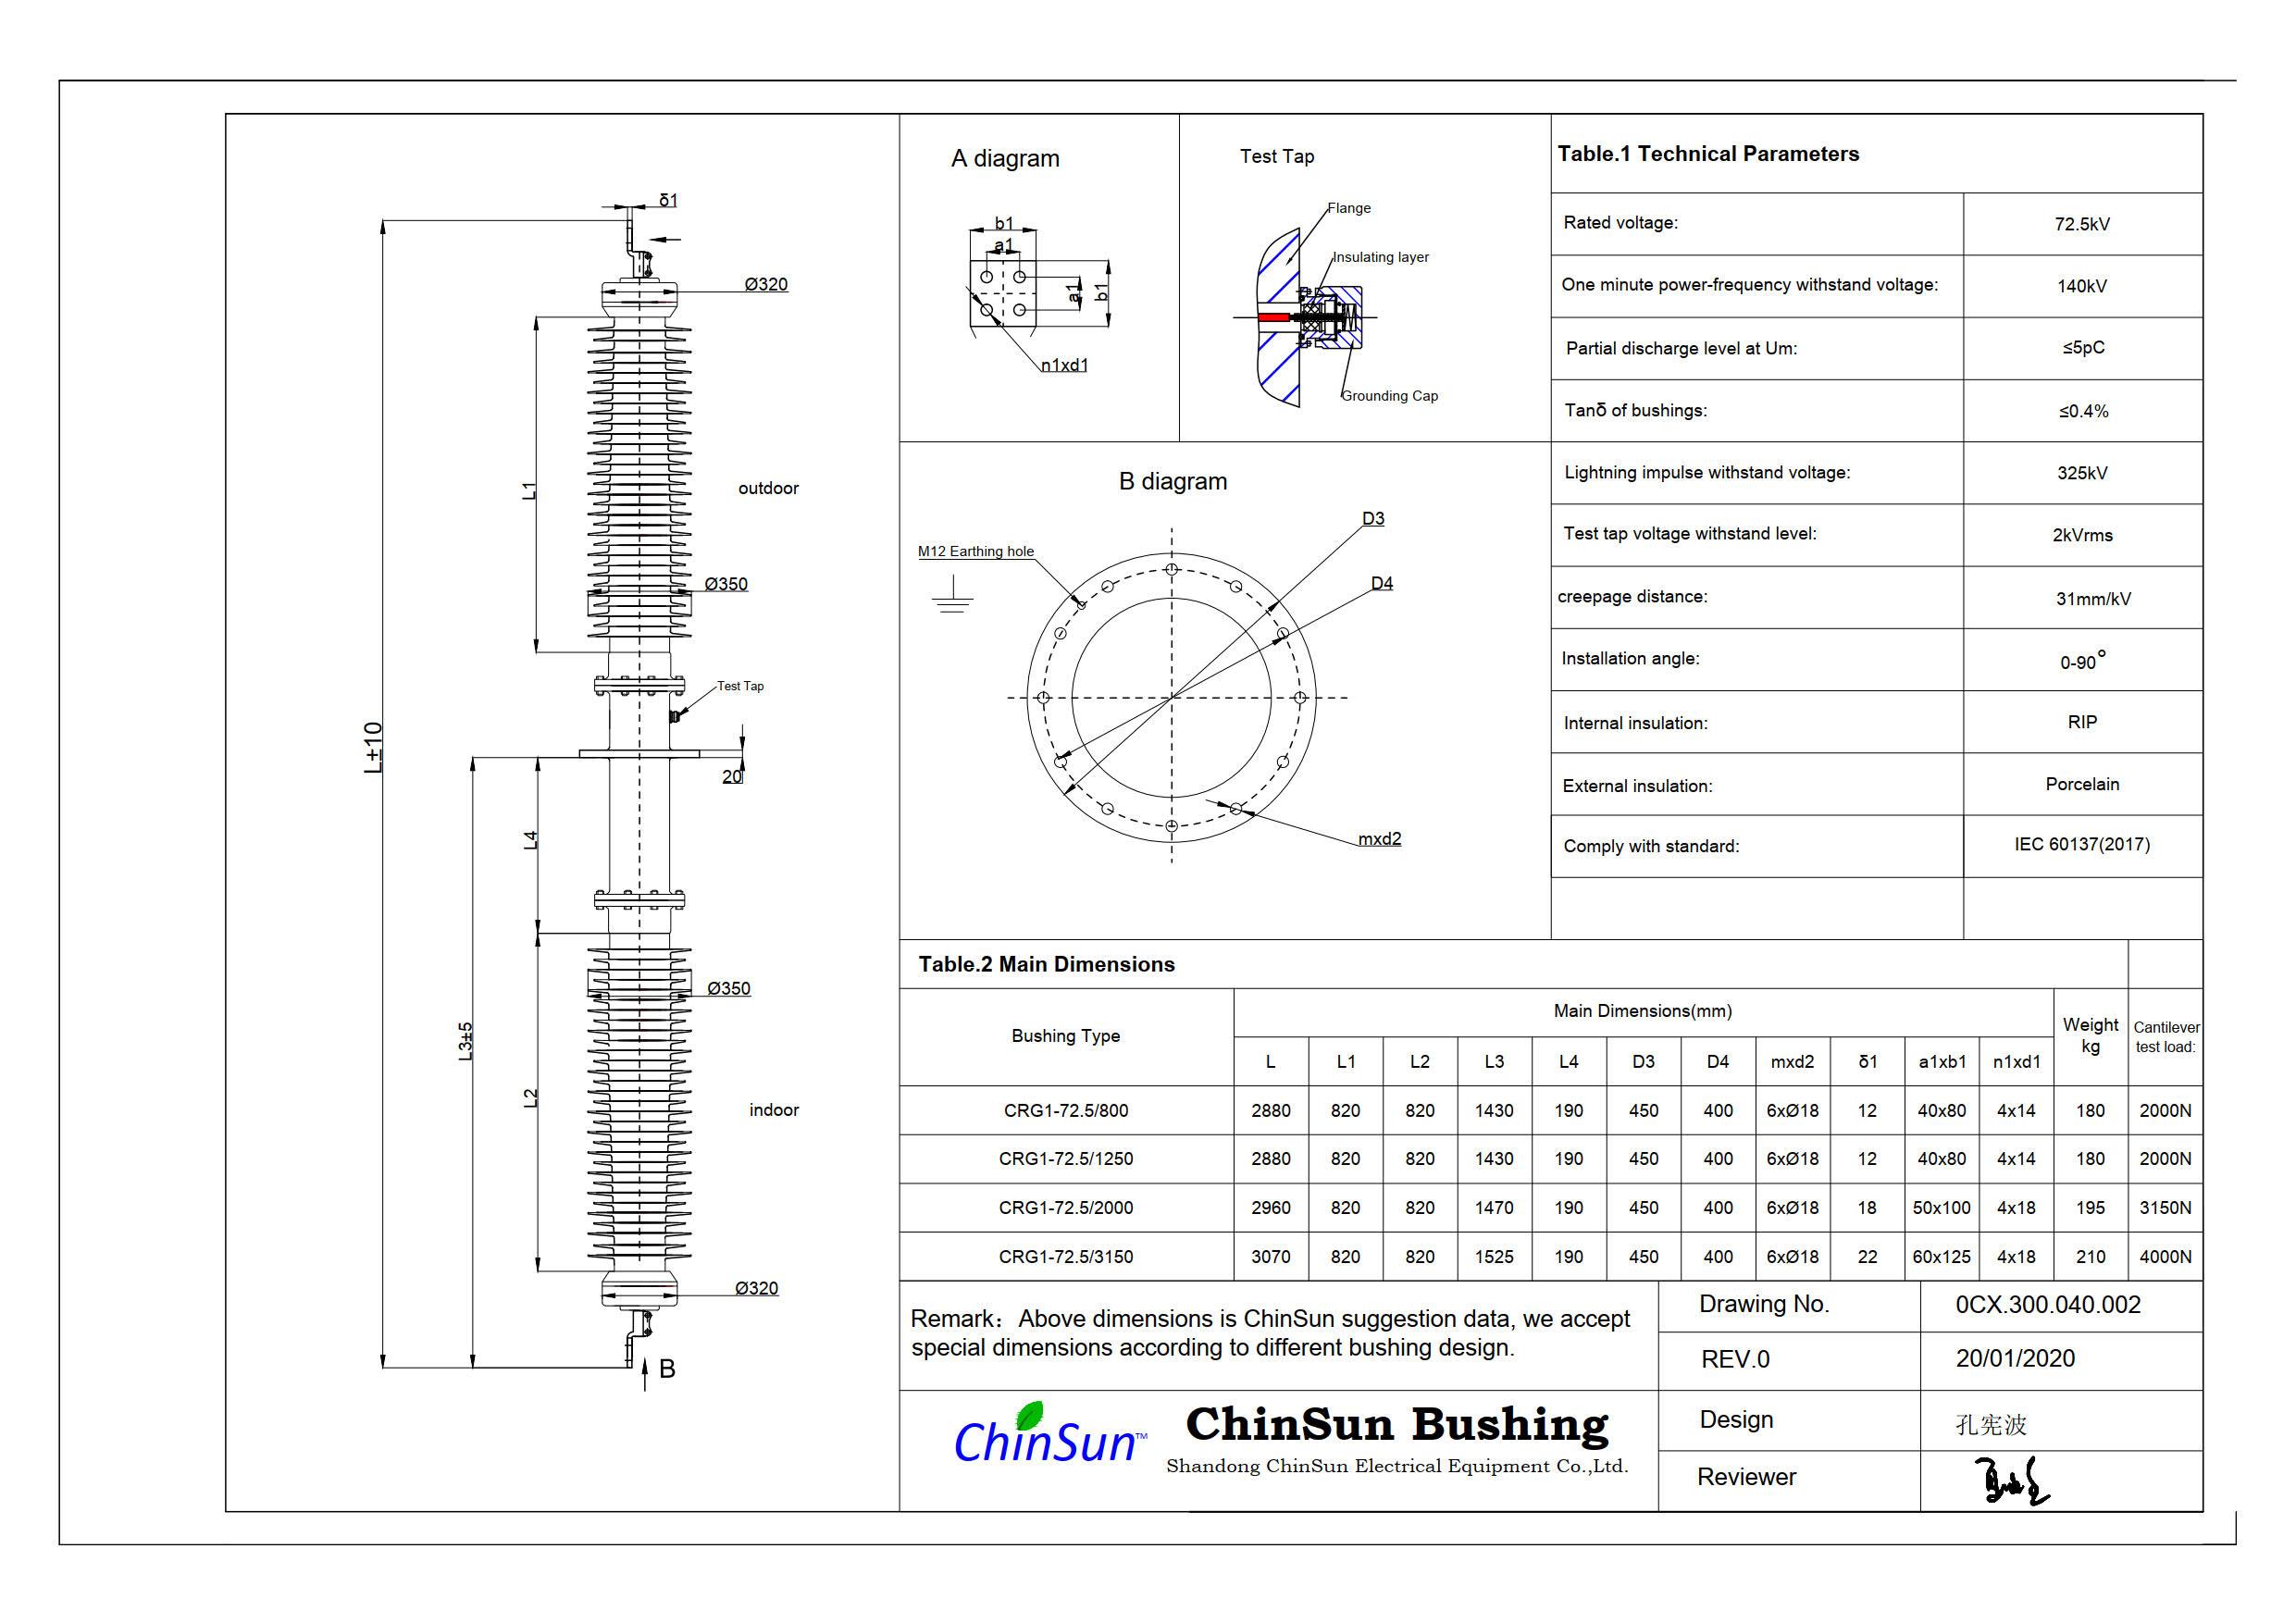 Drawing-wall bushing-72.5kV porcelain-ChinSun